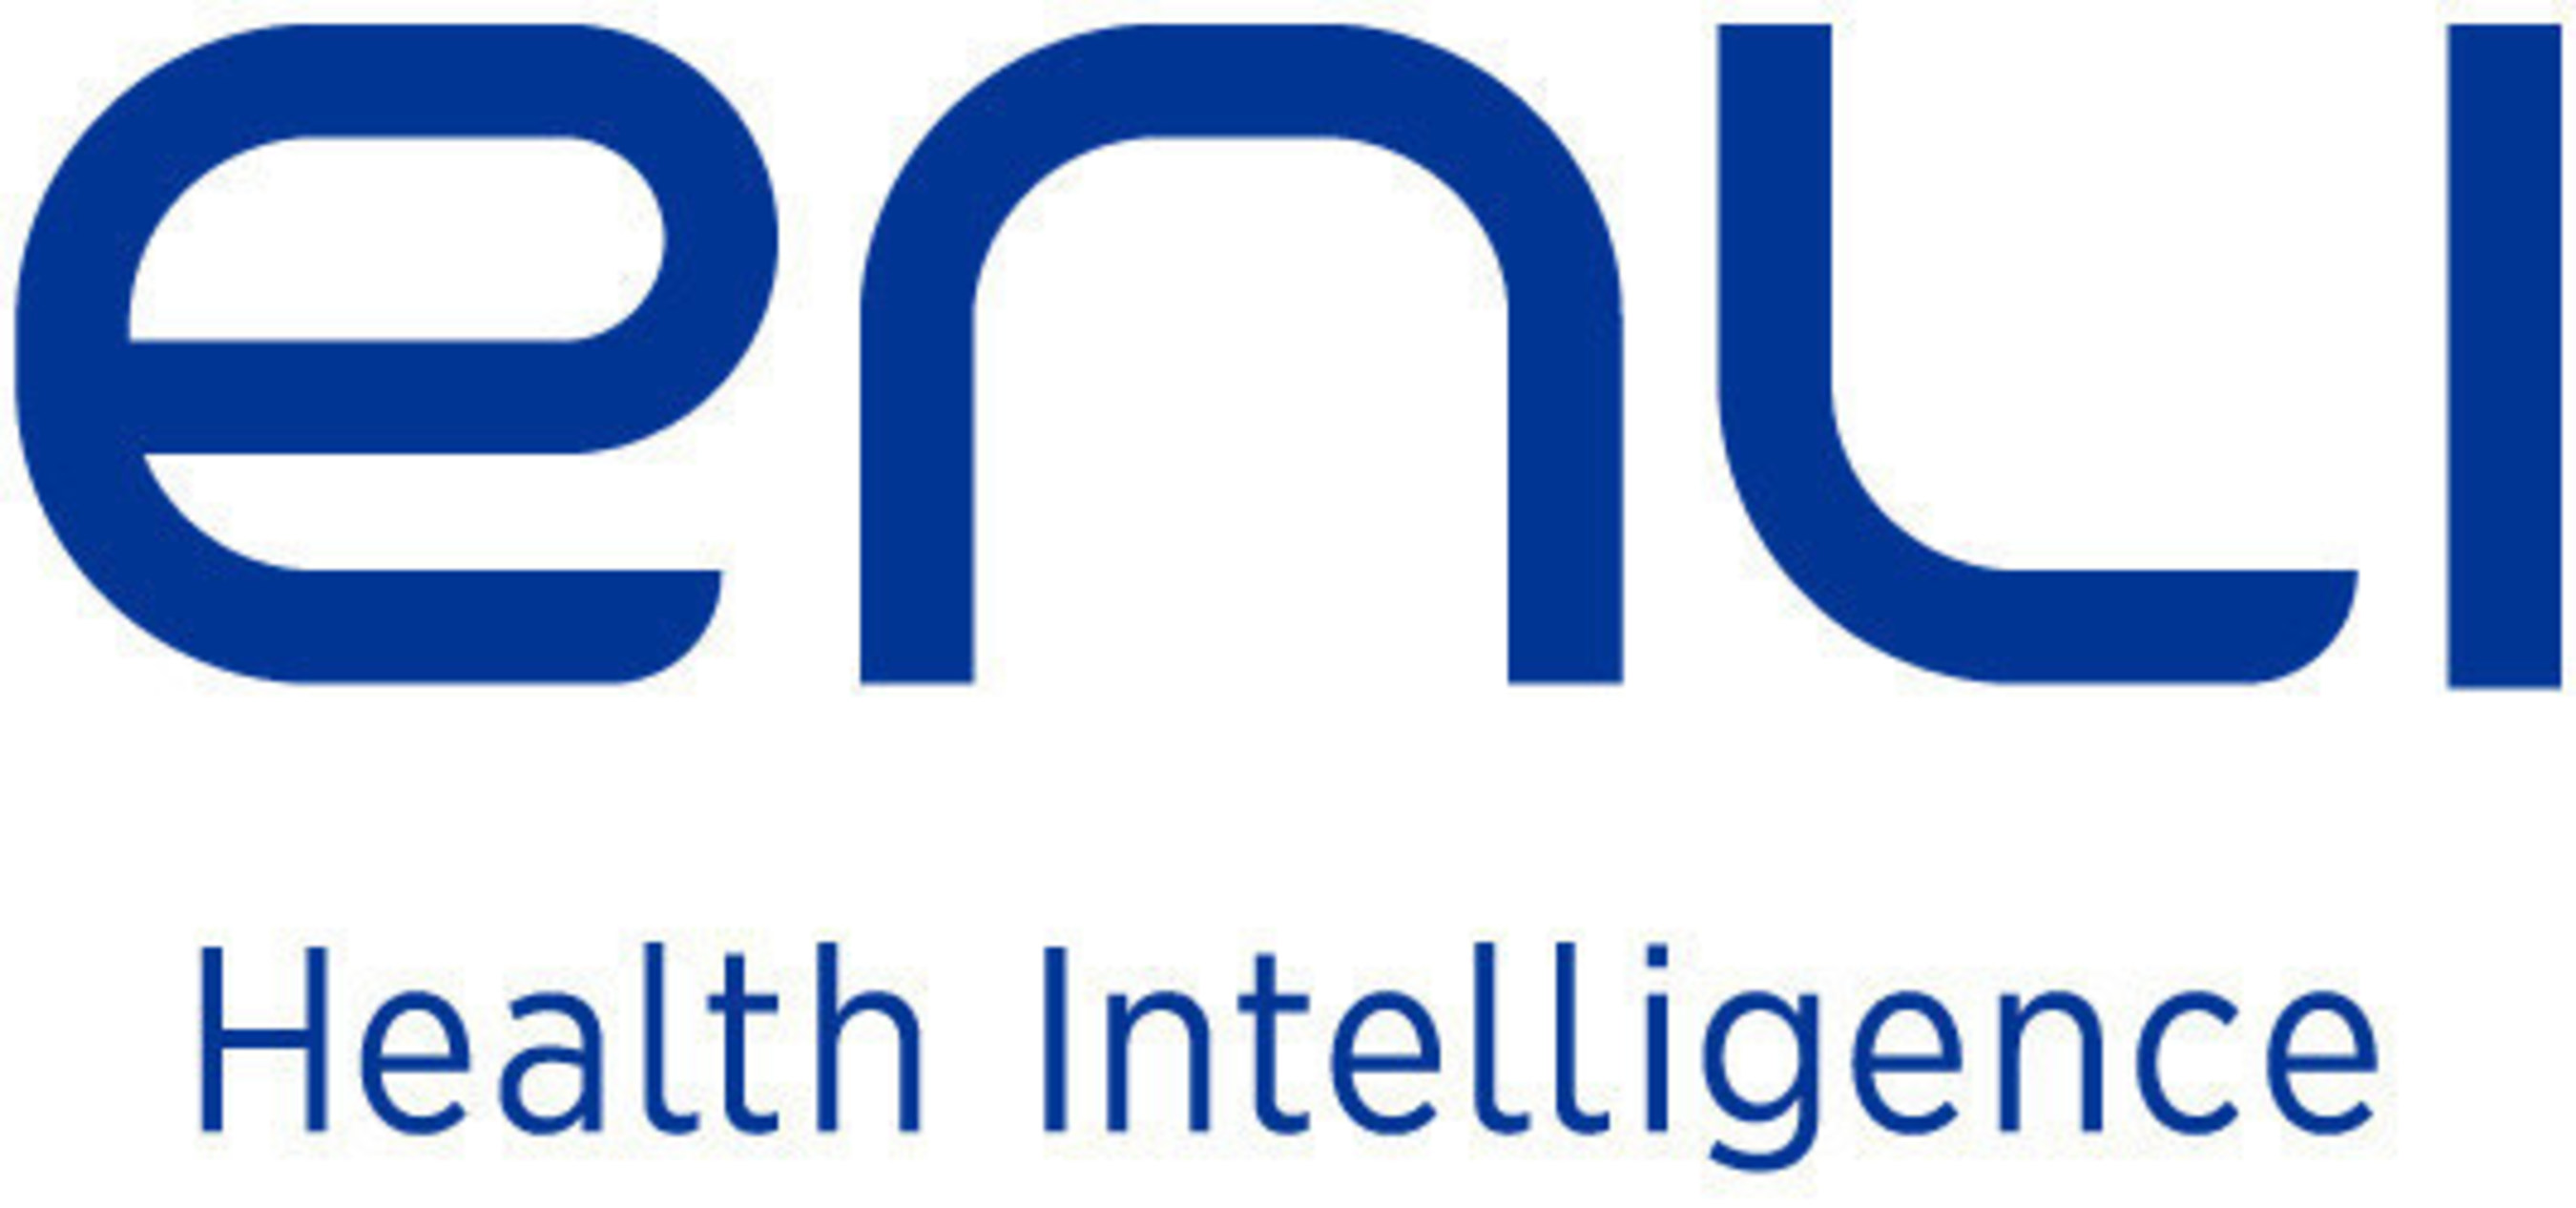 Enli logo